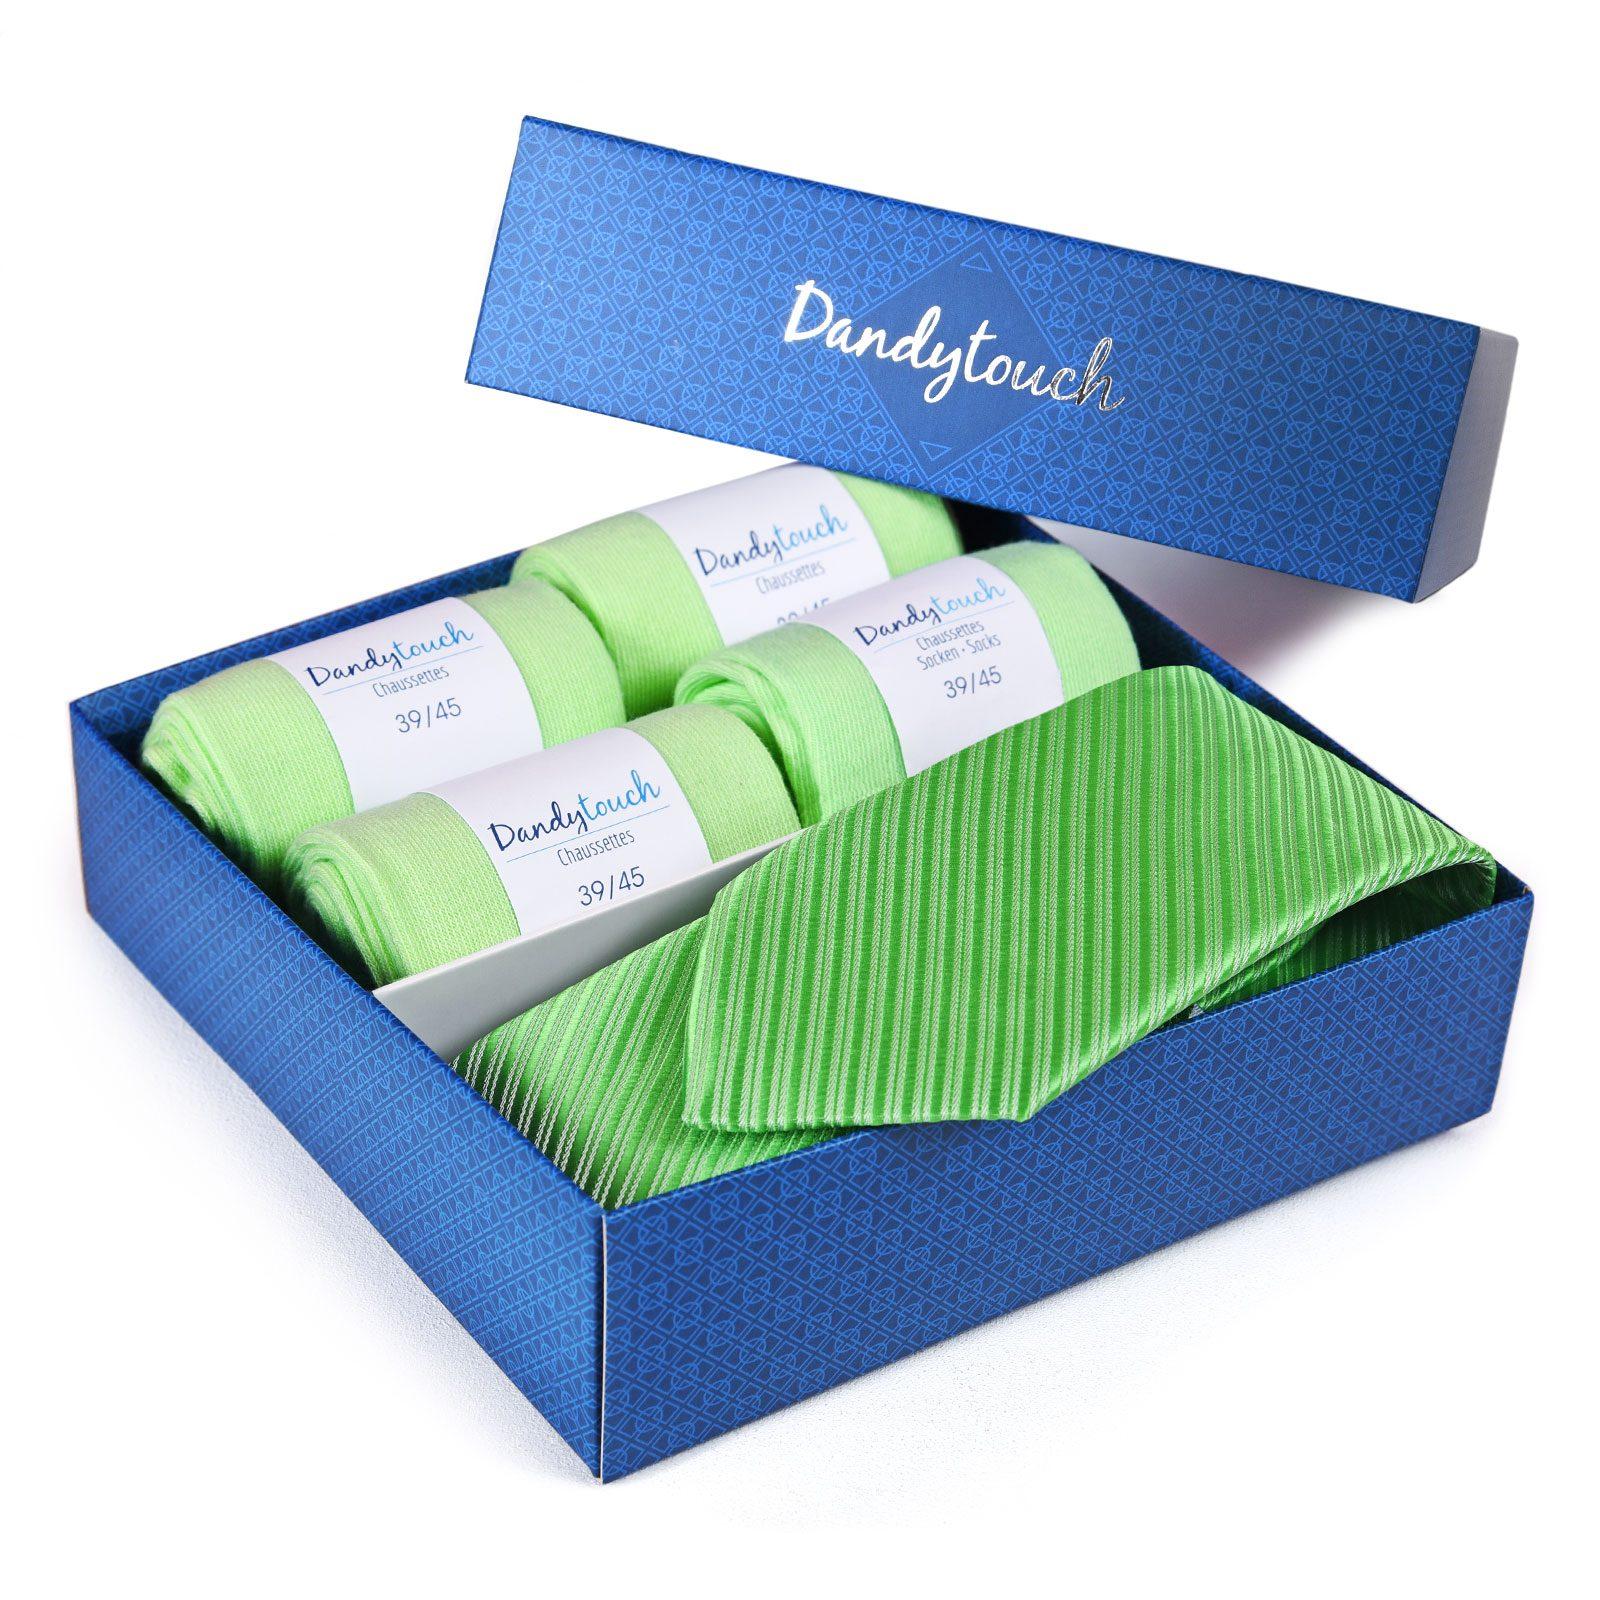 http://lookbook.allee-du-foulard.fr/wp-content/uploads/2018/12/PK-00083-B16-coffret-cadeau-chaussettes-cravate-vert-pomme-1600x1600.jpg